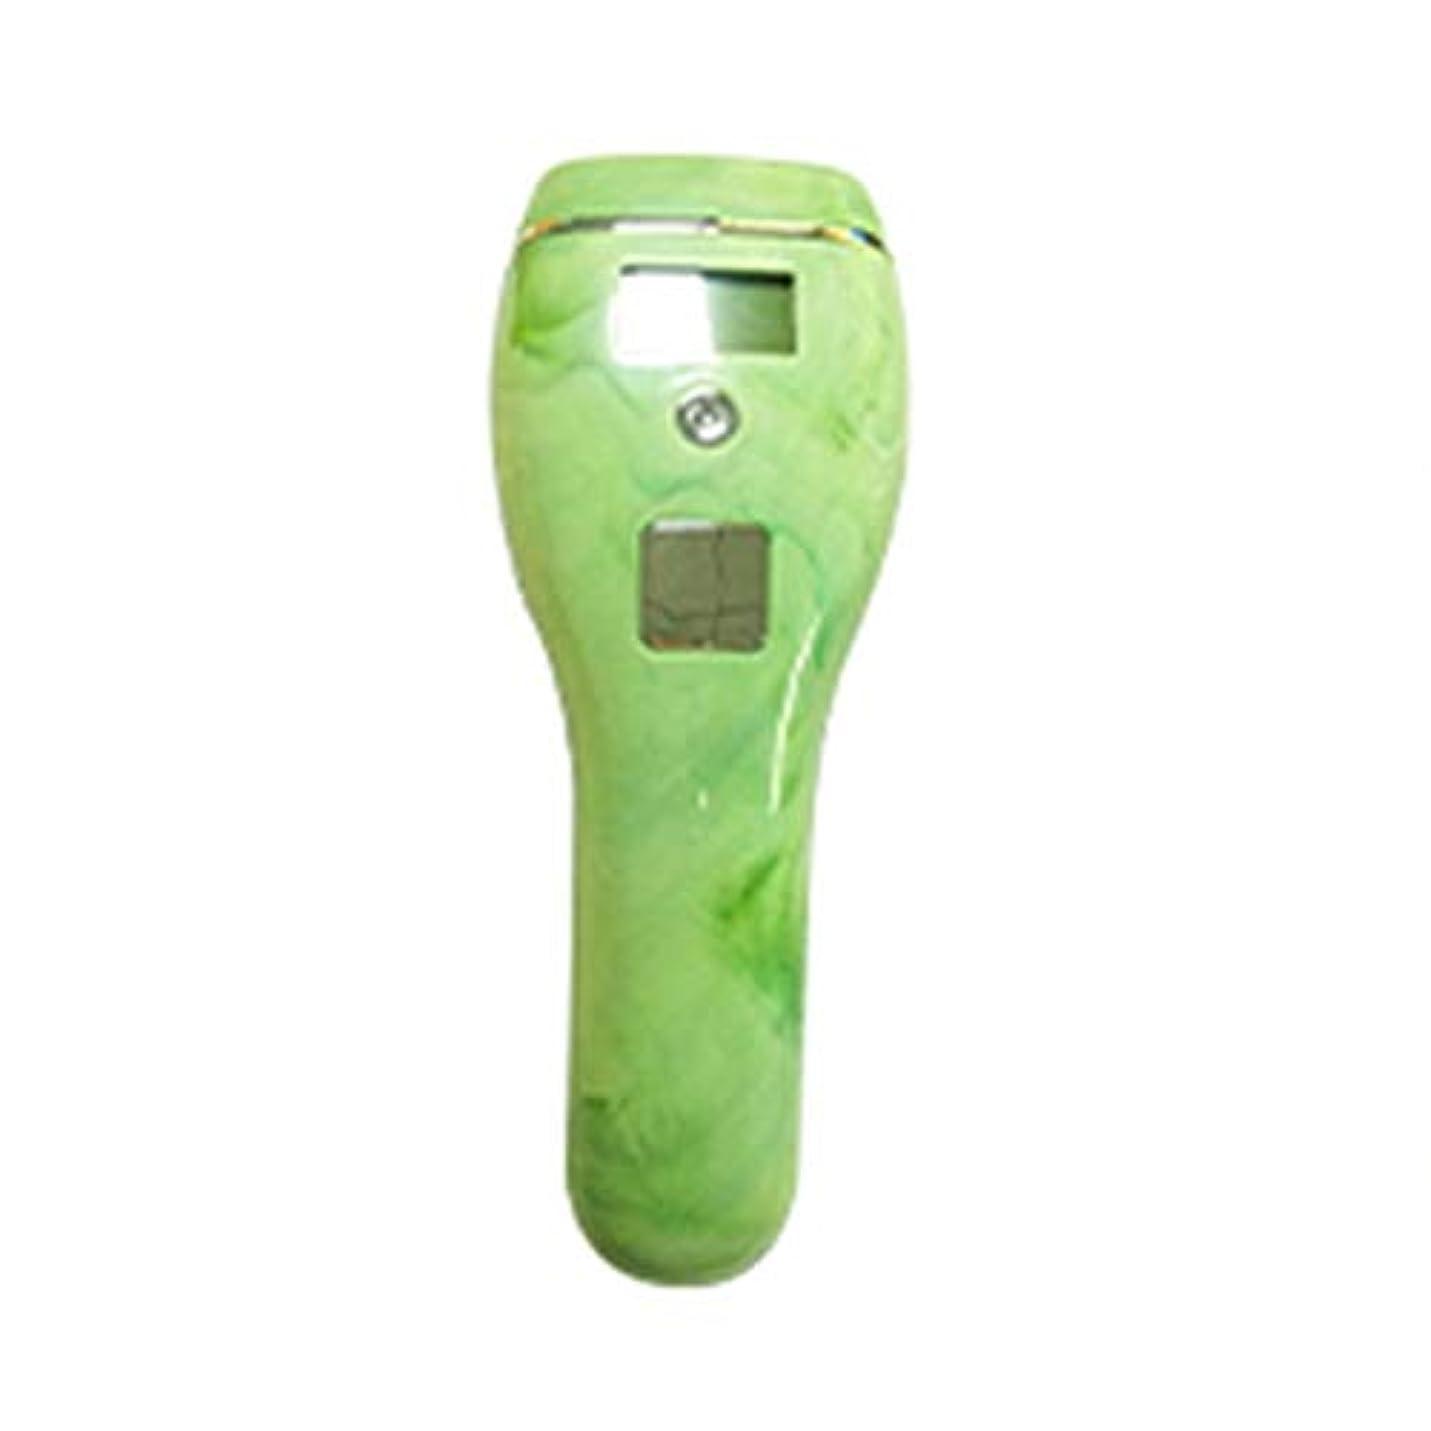 Iku夫 自動肌のカラーセンシング、グリーン、5速調整、クォーツチューブ、携帯用痛みのない全身凍結乾燥用除湿器、サイズ19x7x5cm (Color : Green)